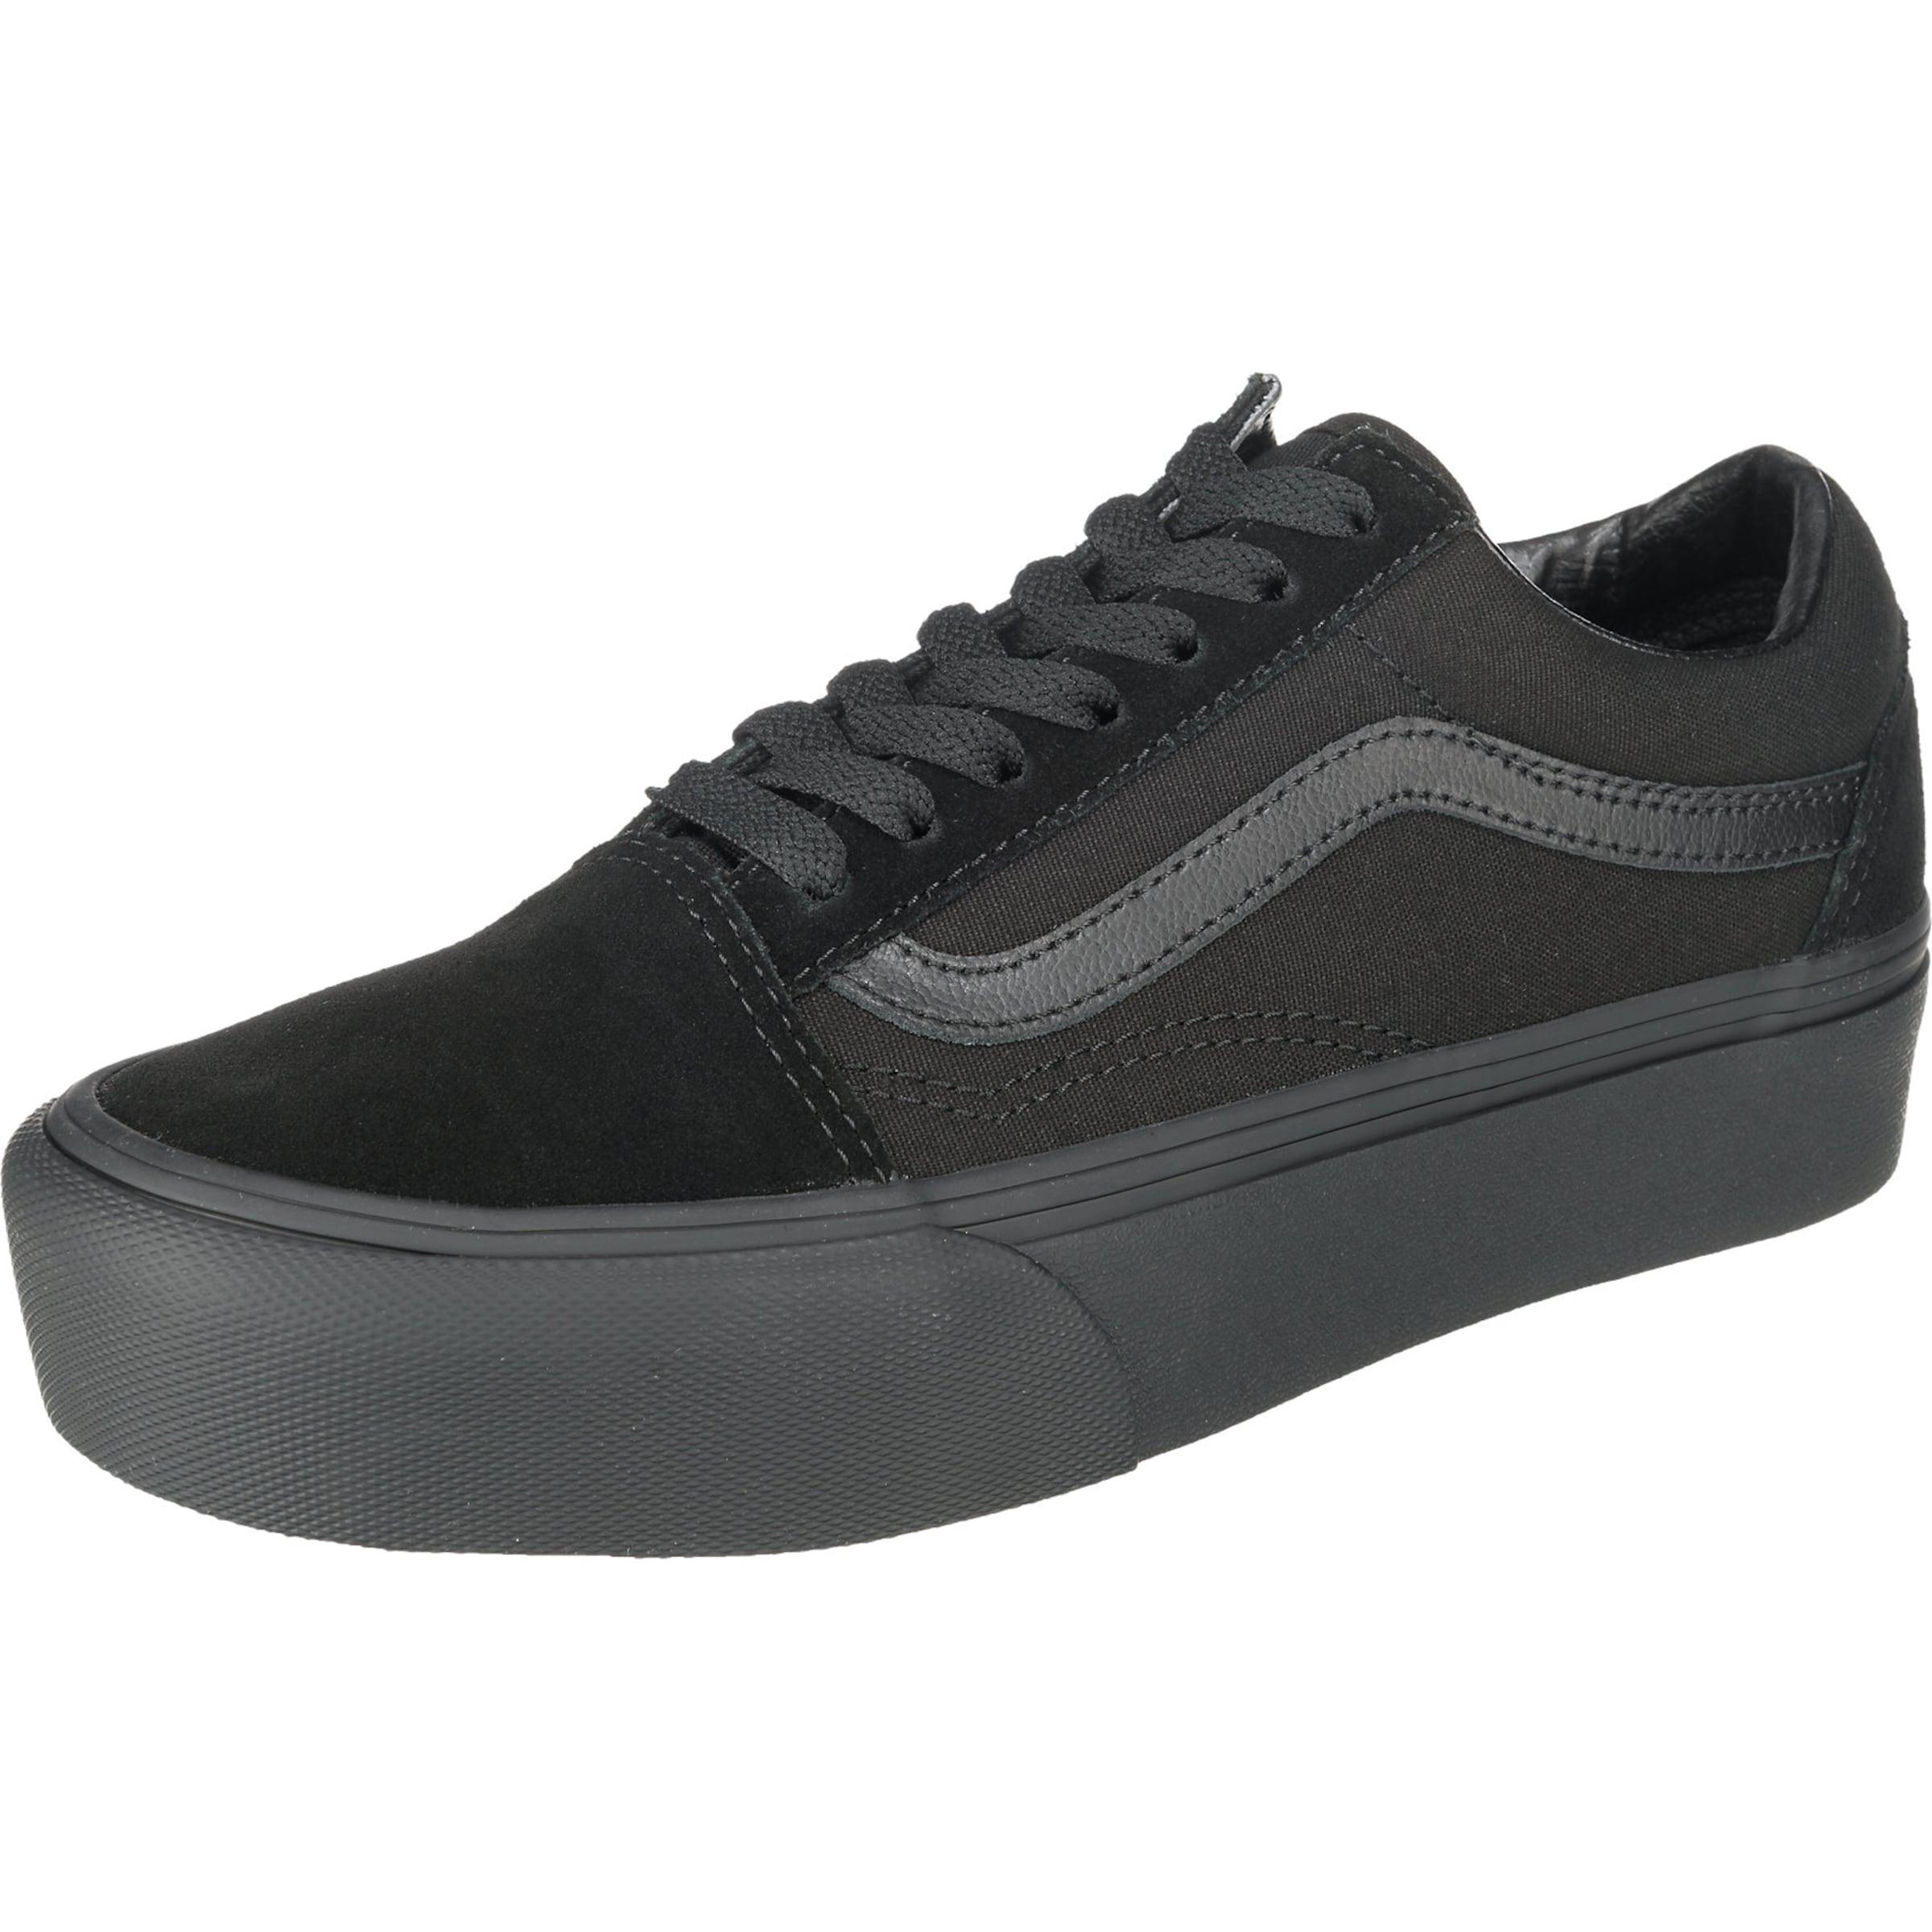 VANS Old Skool Platform Sneakers Spielraum Heißen Verkauf UzdKDcIk23